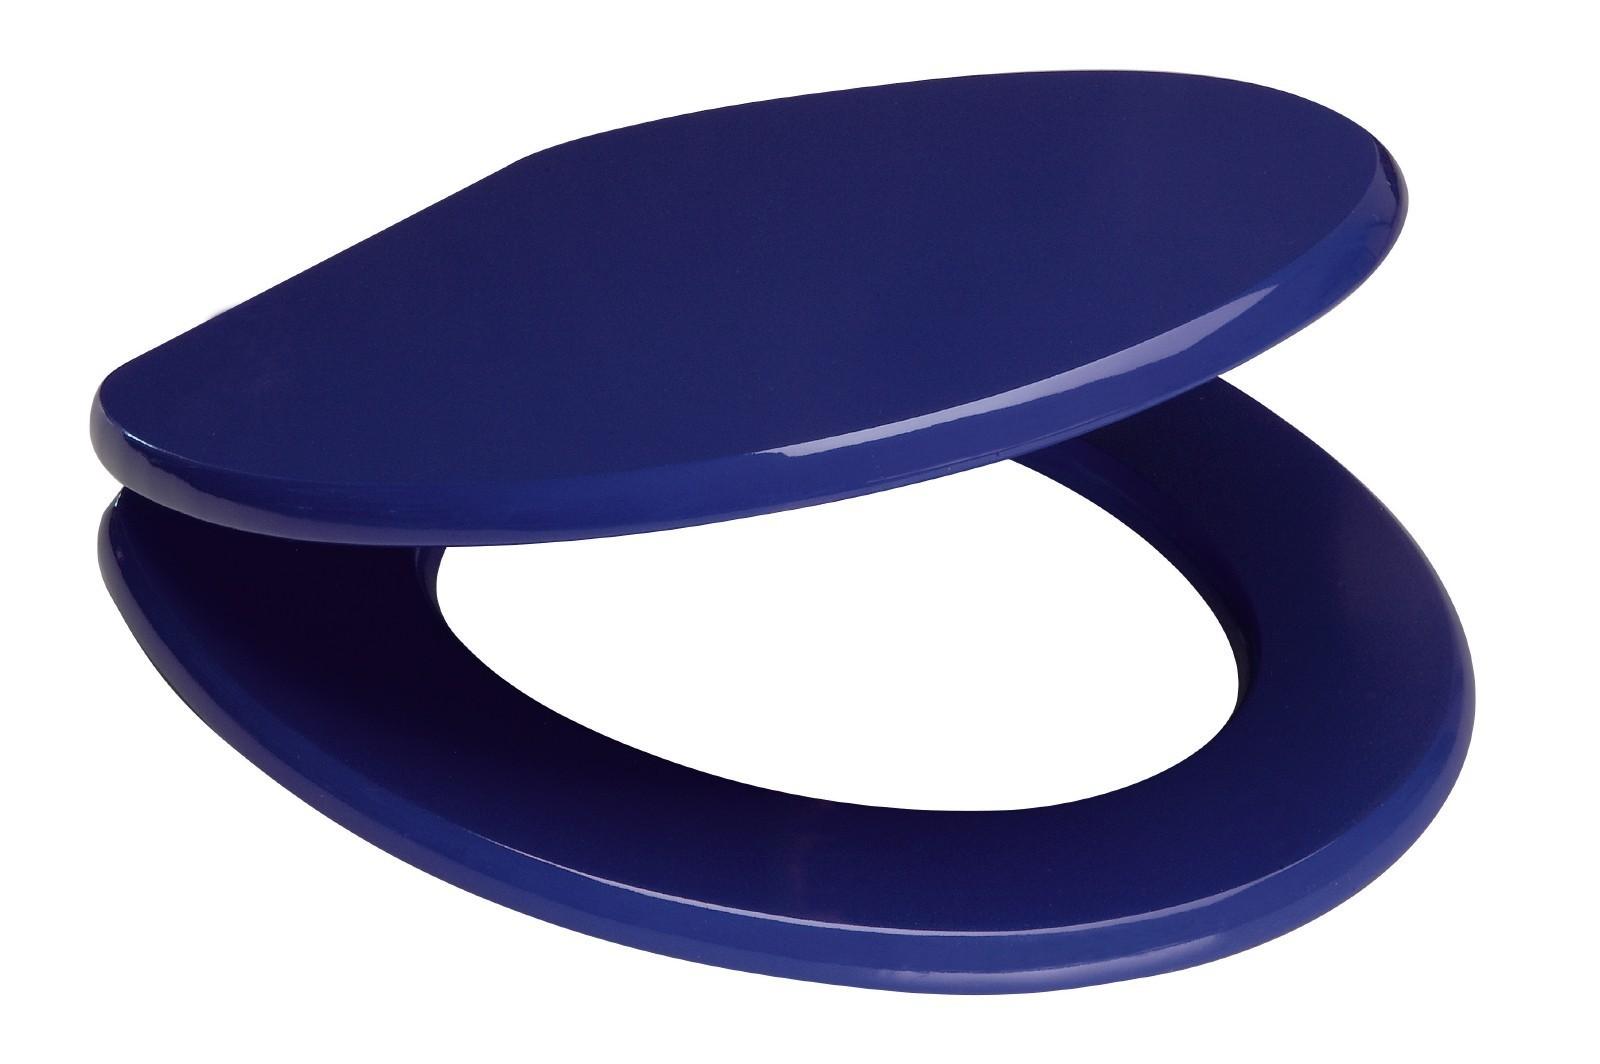 sanitop wingenroth wc sitz venezia blau holzkern metallschar. Black Bedroom Furniture Sets. Home Design Ideas